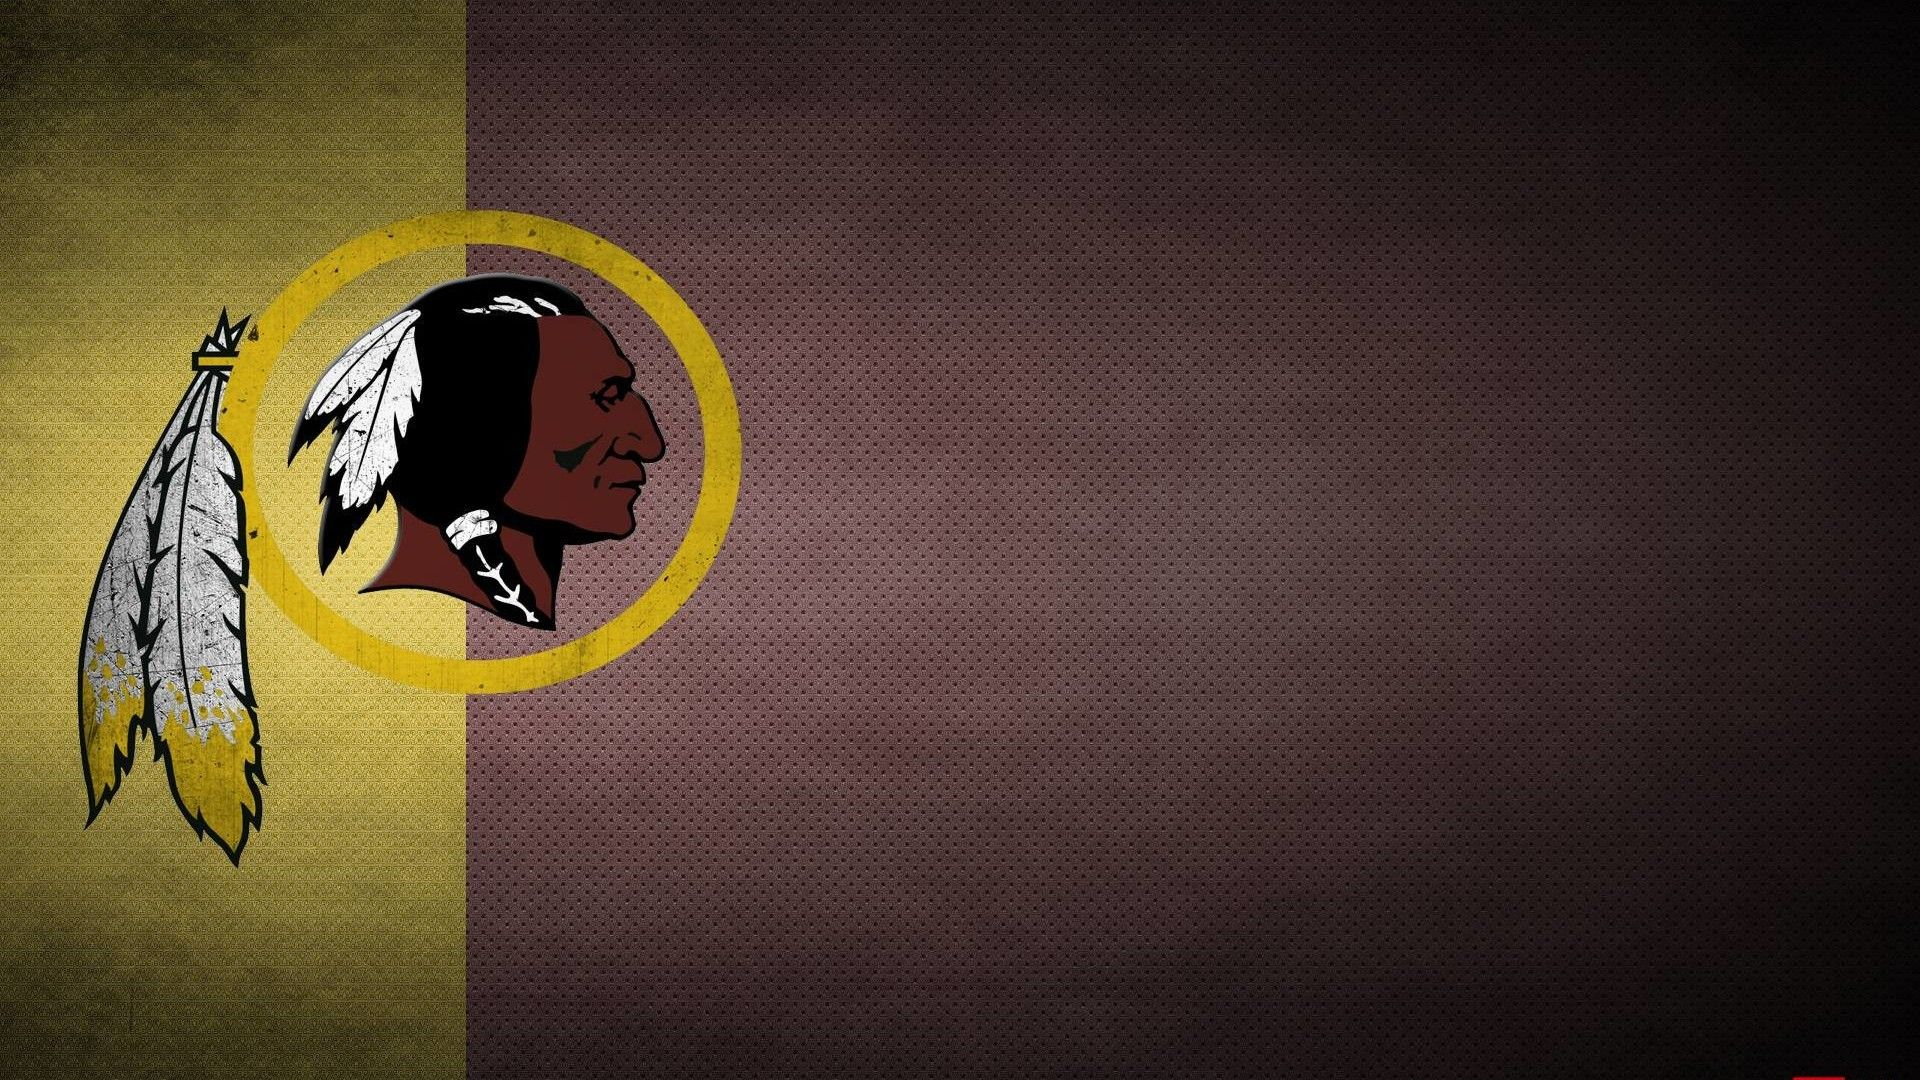 Washington Redskins Desktop Wallpaper Football wallpaper